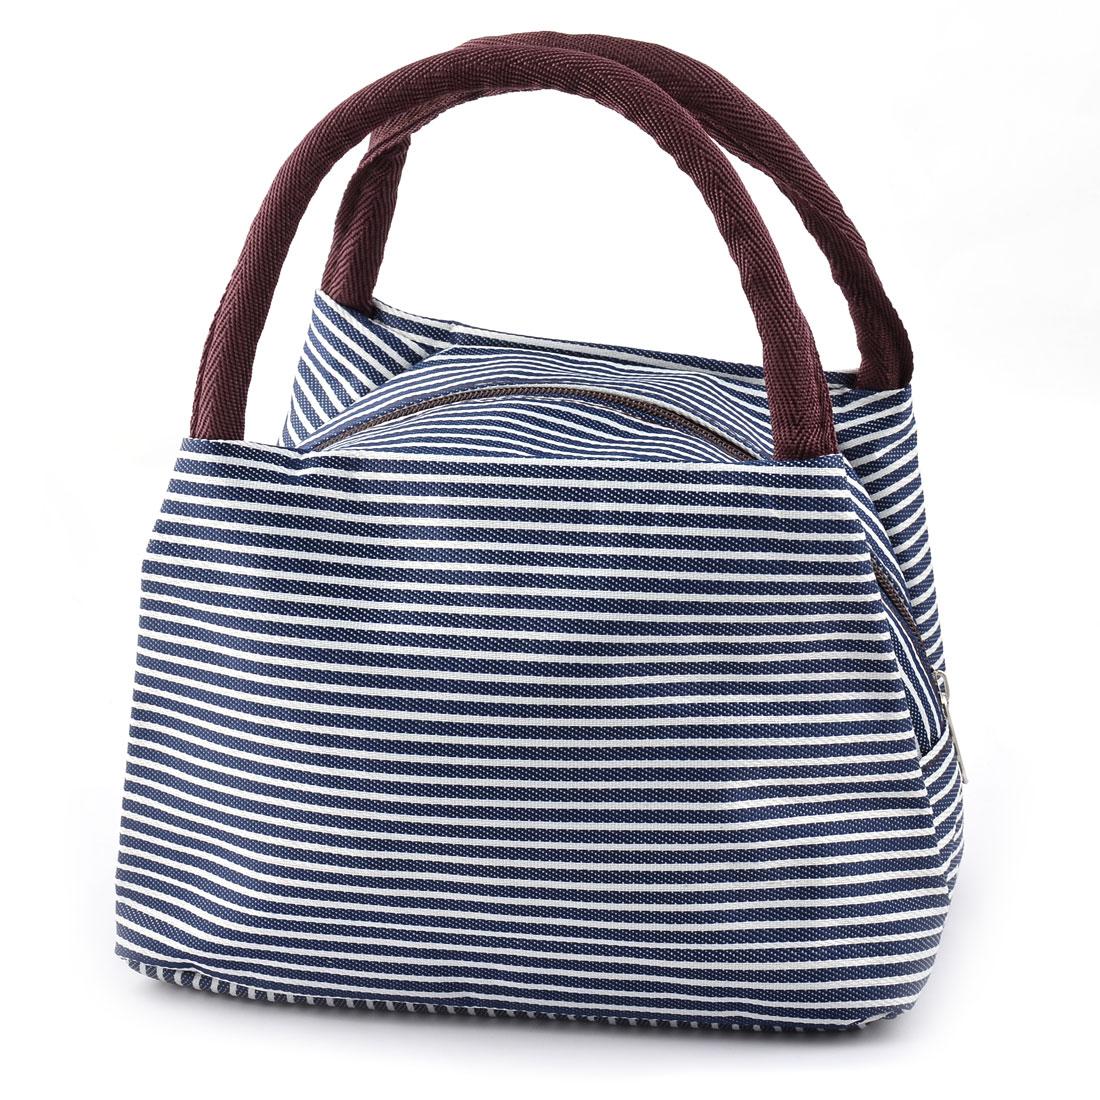 Outdoor Linen Cotton Stripe Pattern Lunch Holder Cooler Pouch Handbag Bag